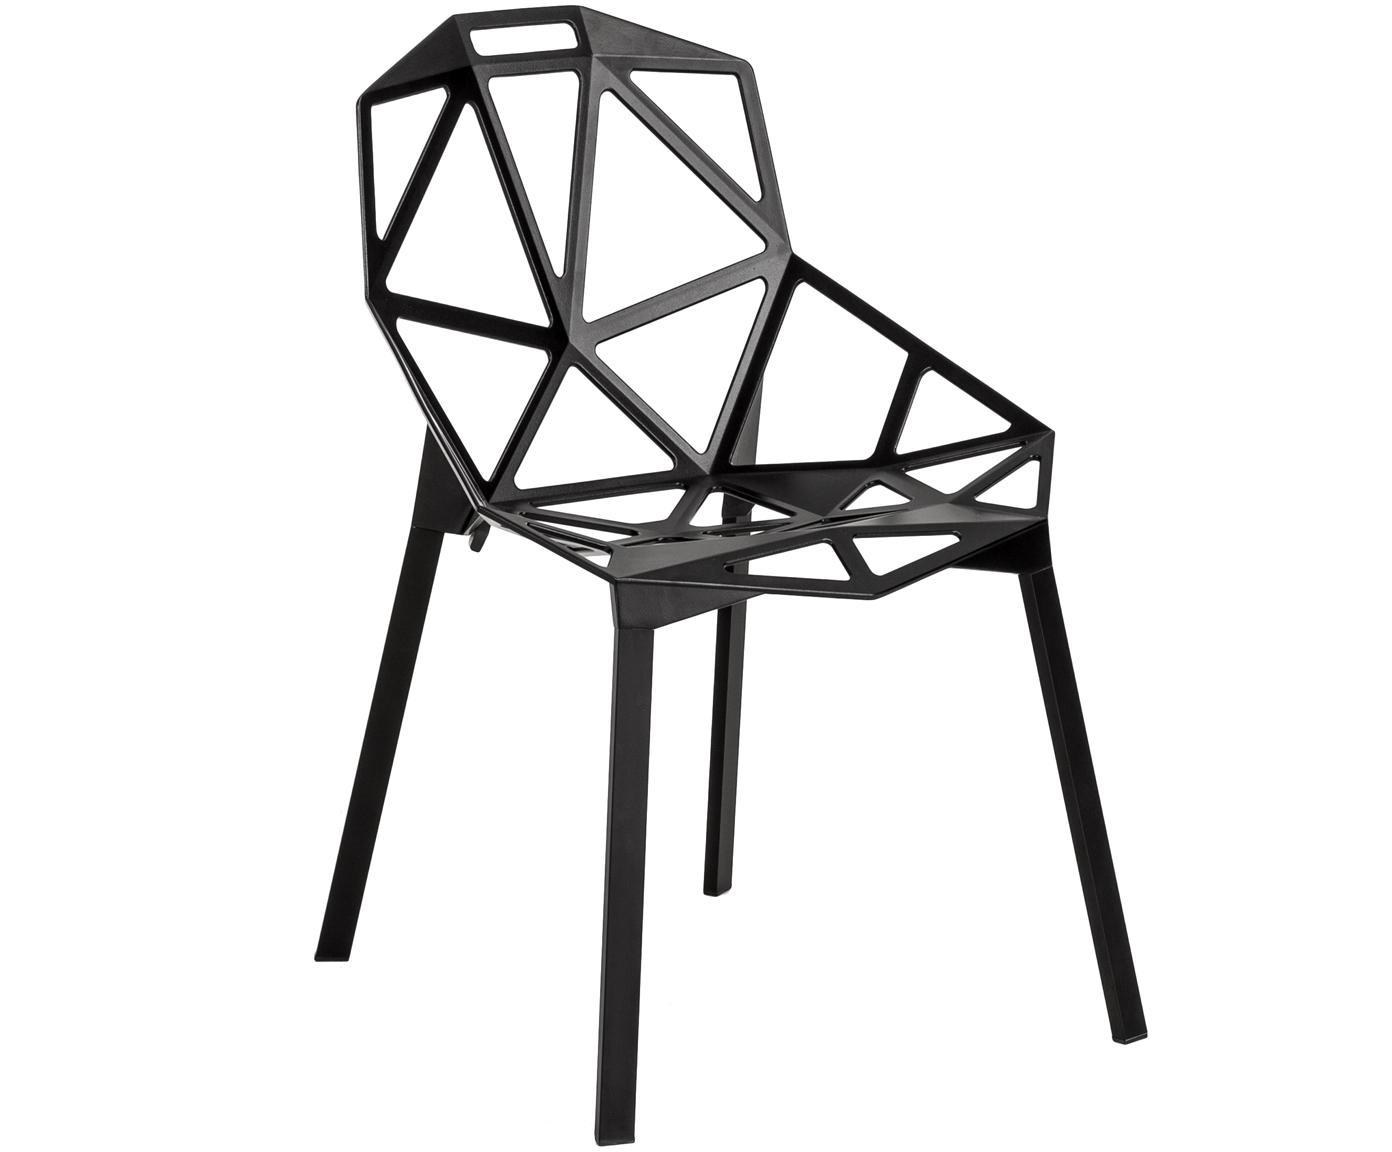 Design-Metallstuhl Chair One, Aluminium, druckgegossen, polyester-lackiert, Schwarz, B 55 x T 59 cm